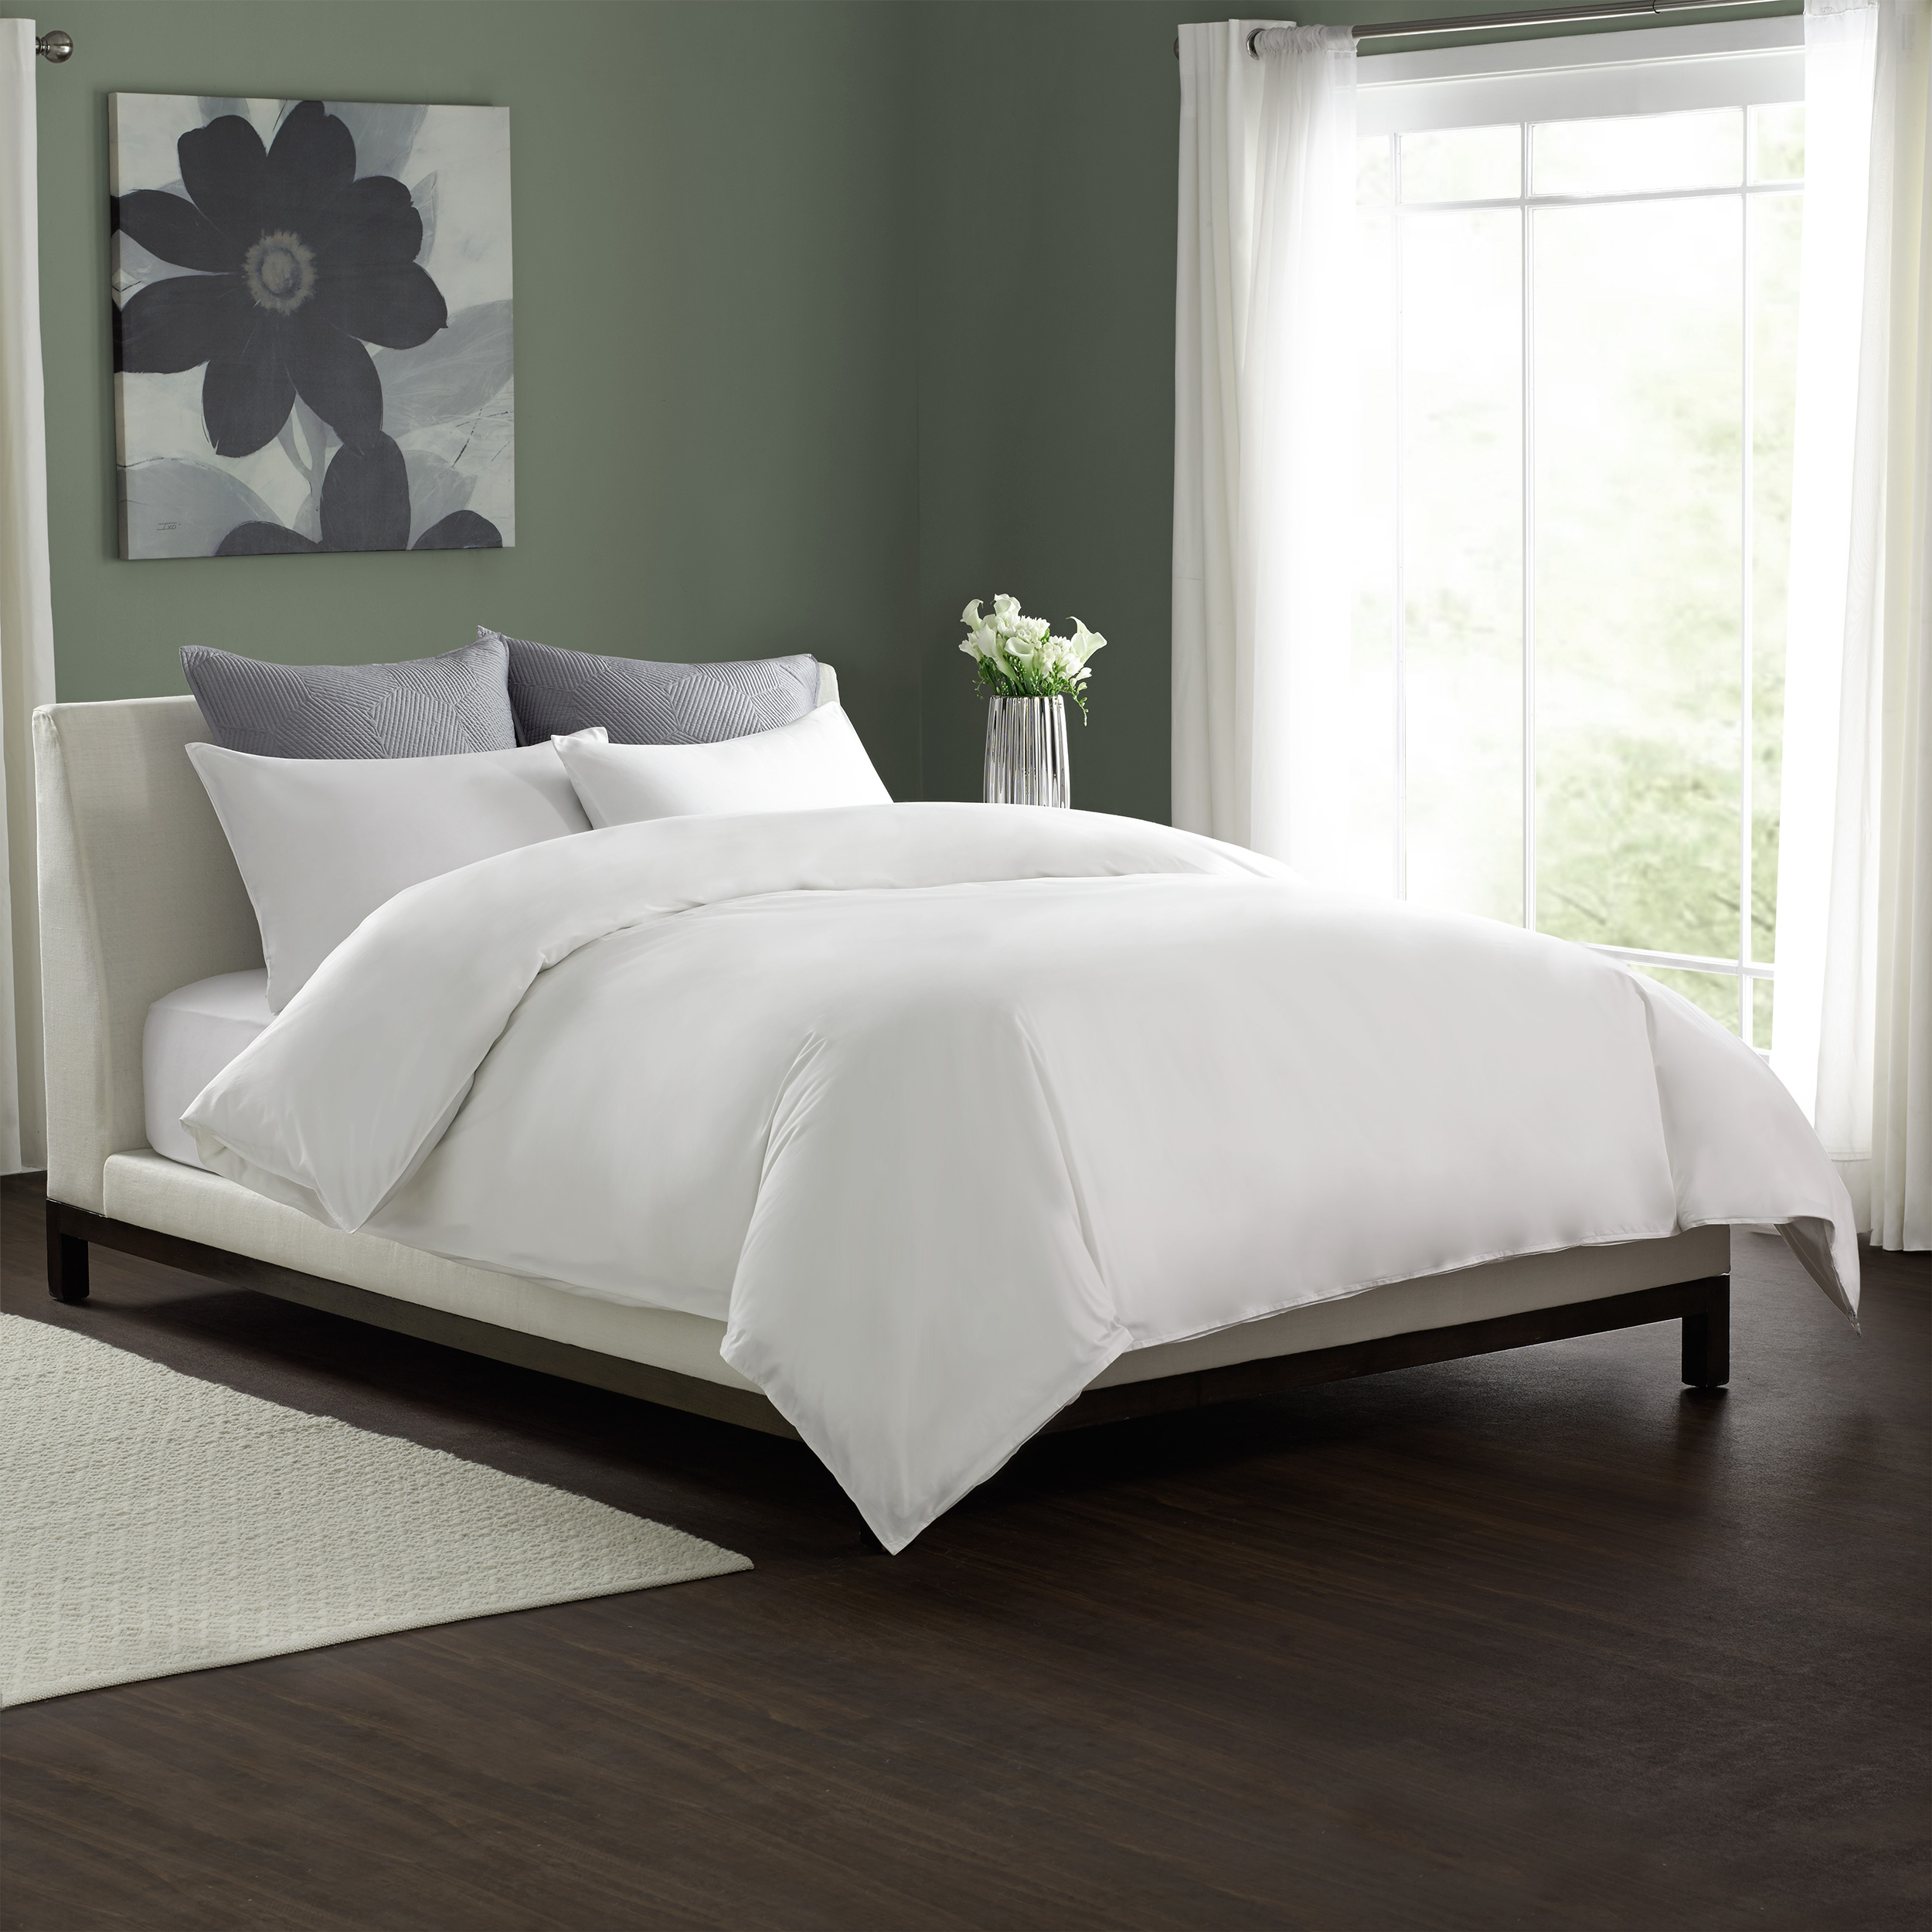 Pacific Coast® Online Bedding Stores Duvets